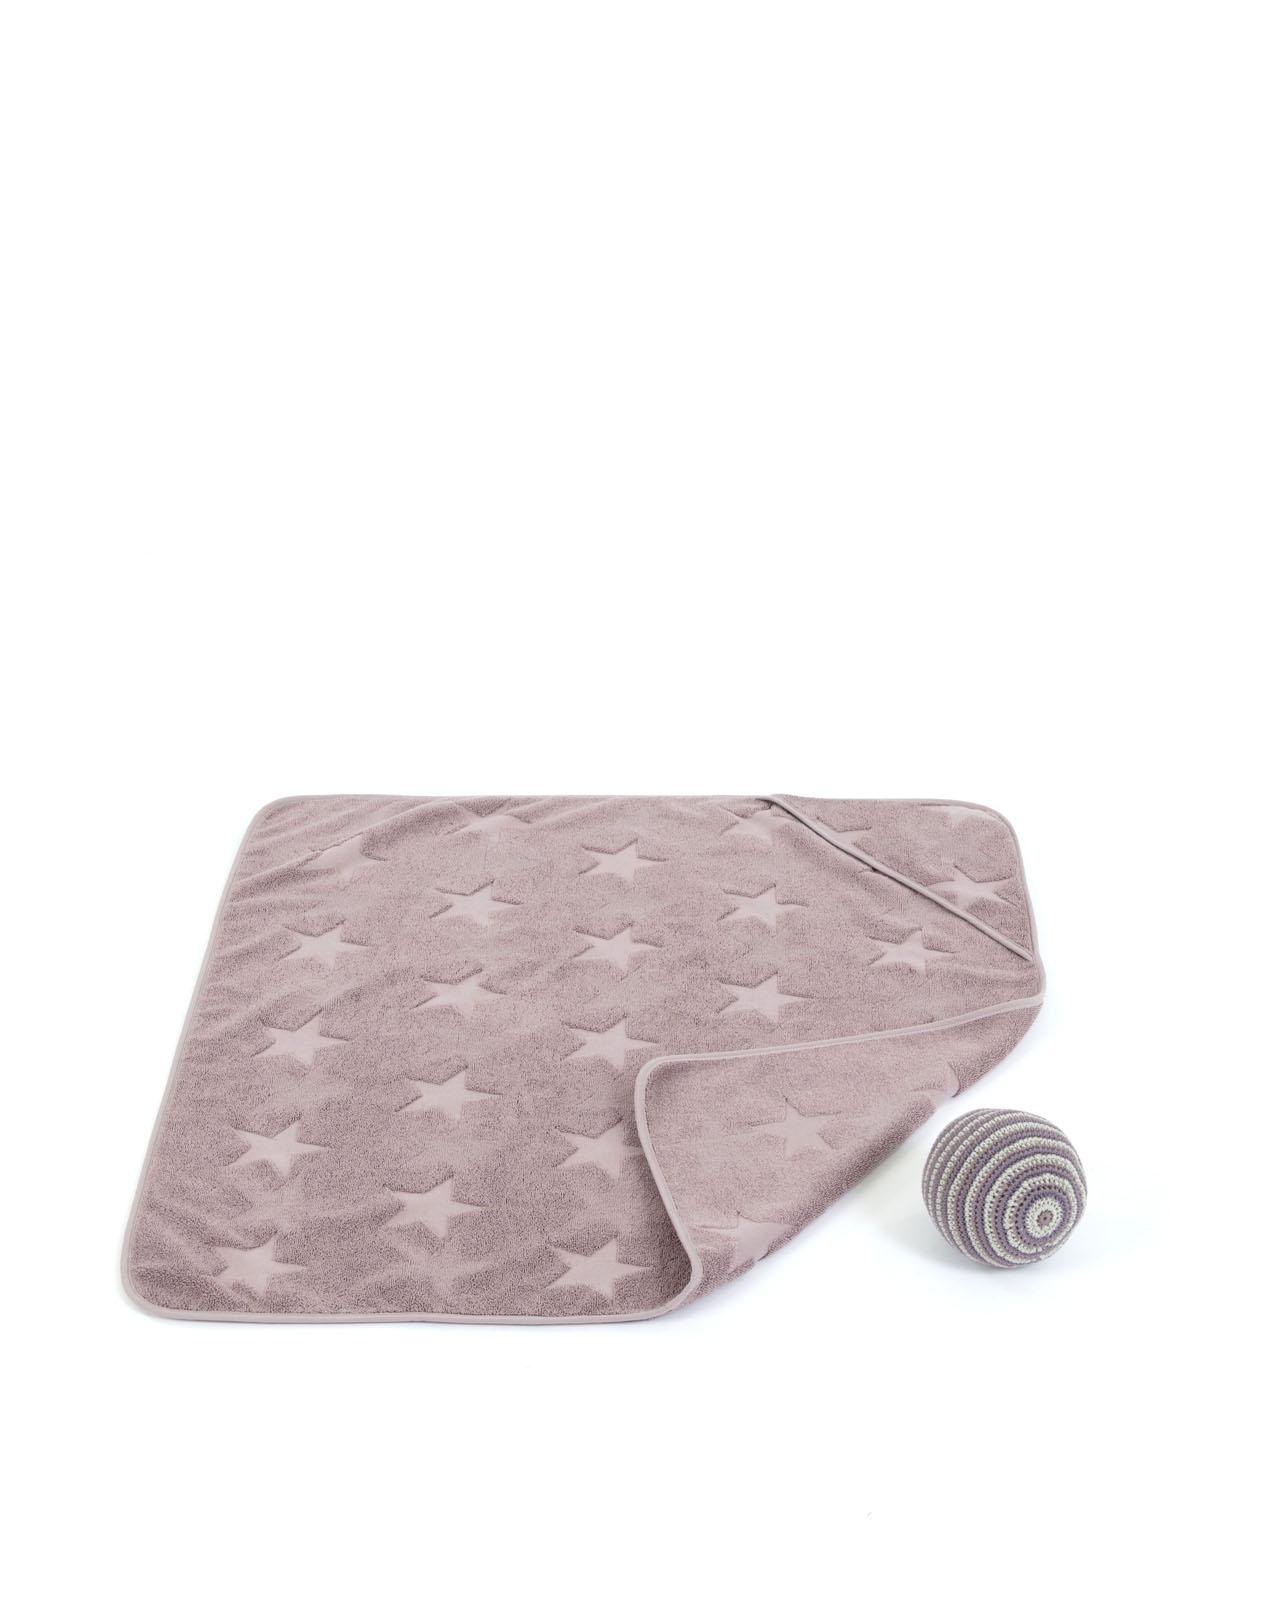 Smallstuff – Pudder badeslag fra smallstuff, 2 stk. på lager på pixizoo